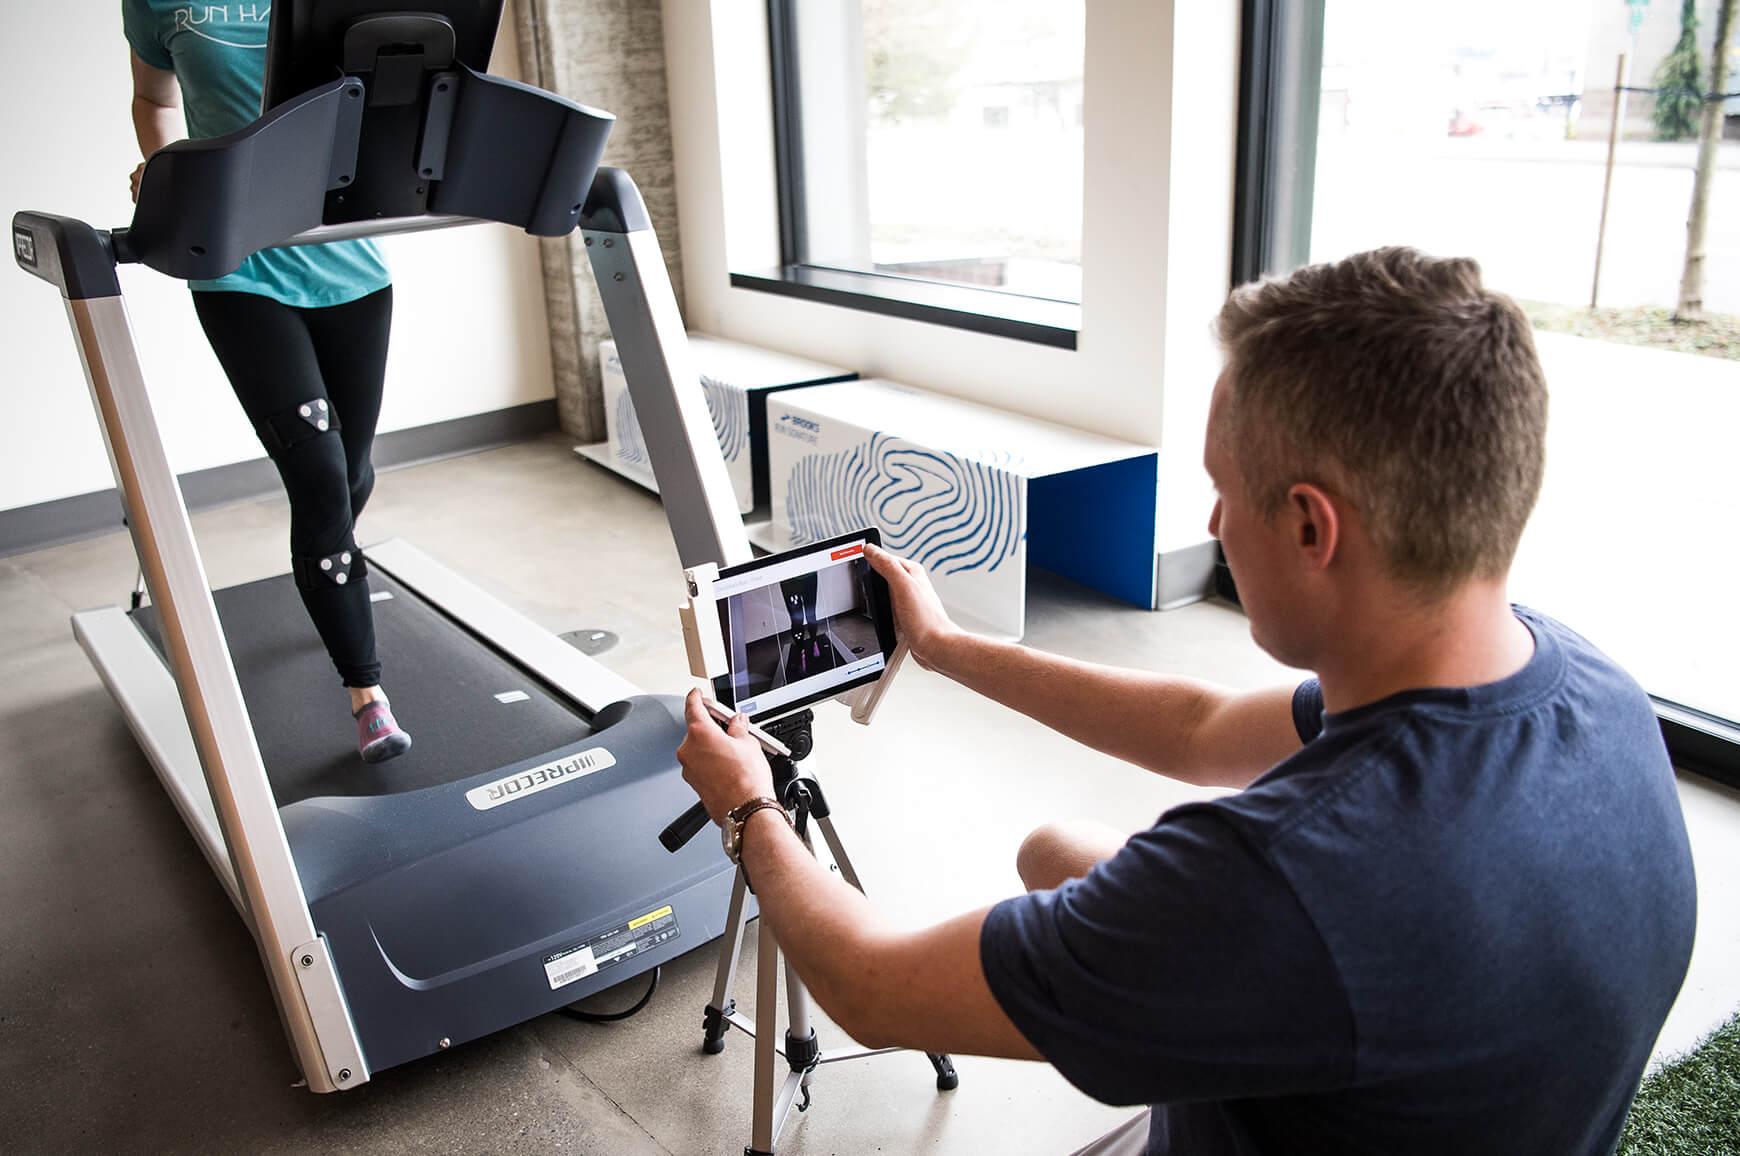 A Brooks employee analyzing a runner's gait on a treadmill